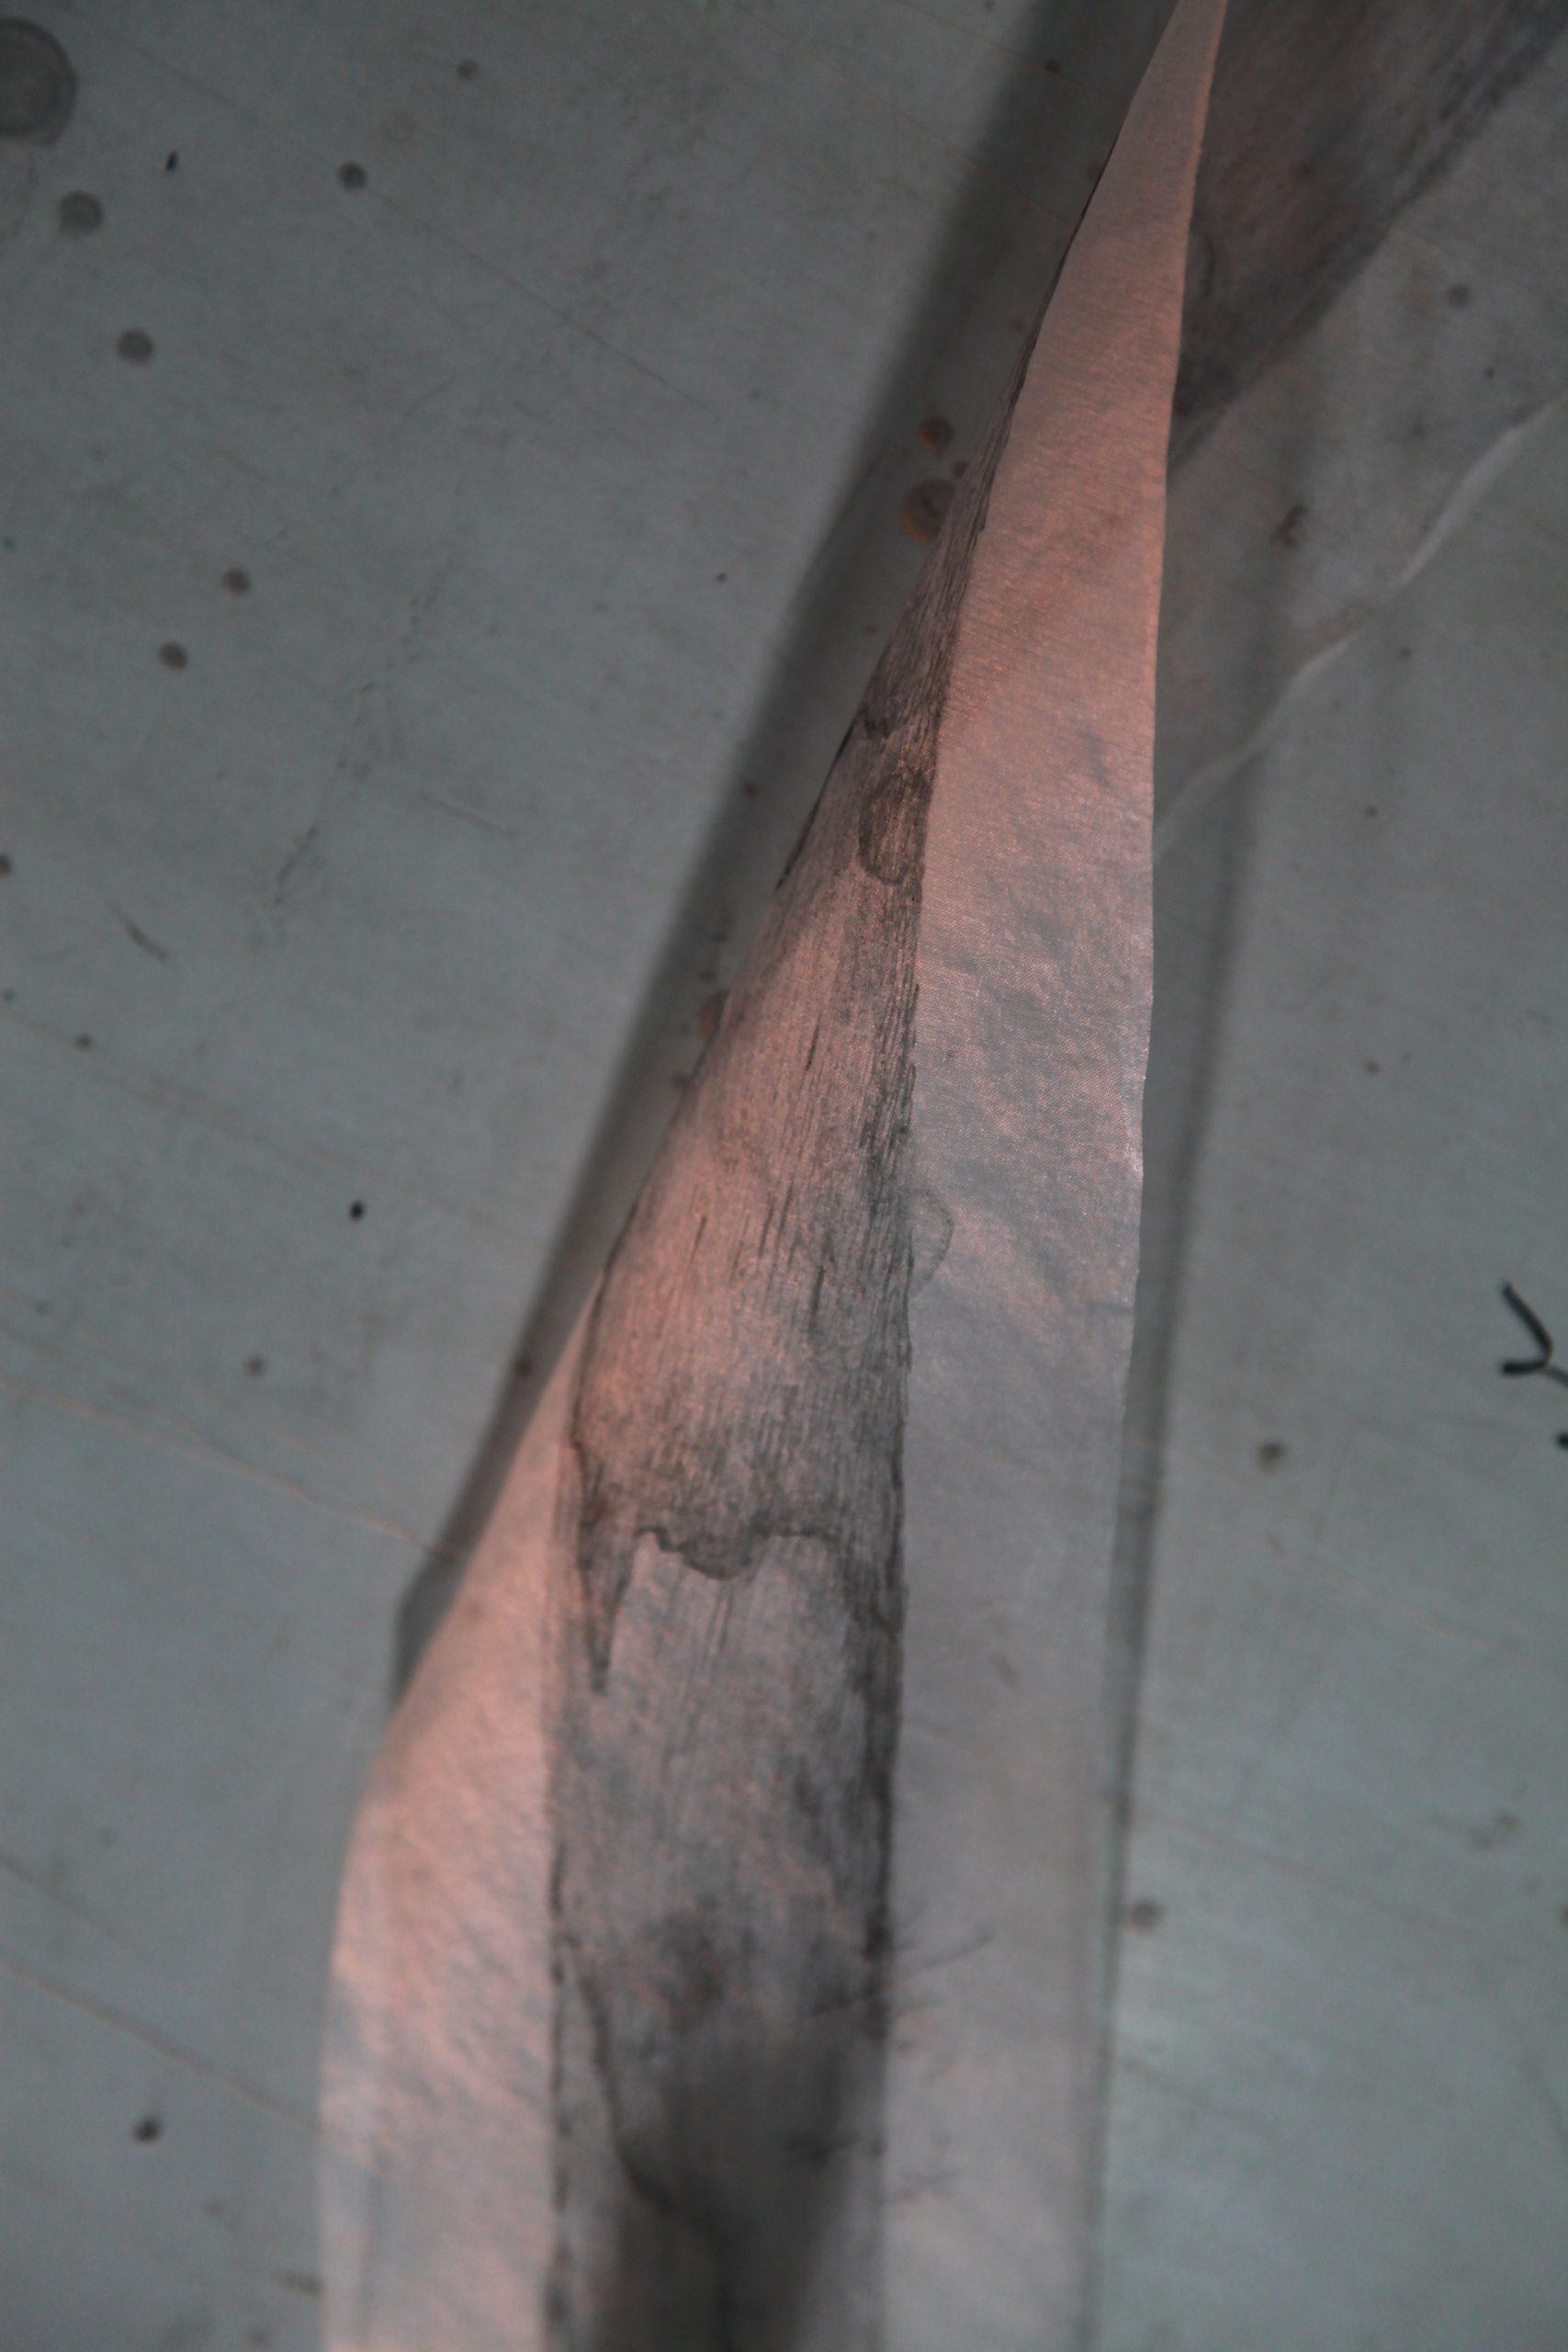 Painted raw silk, a work in progress in Hu Xiaoyuan's studio. Photo courtesy of Hu Xiaoyuan and Beijing Commune.